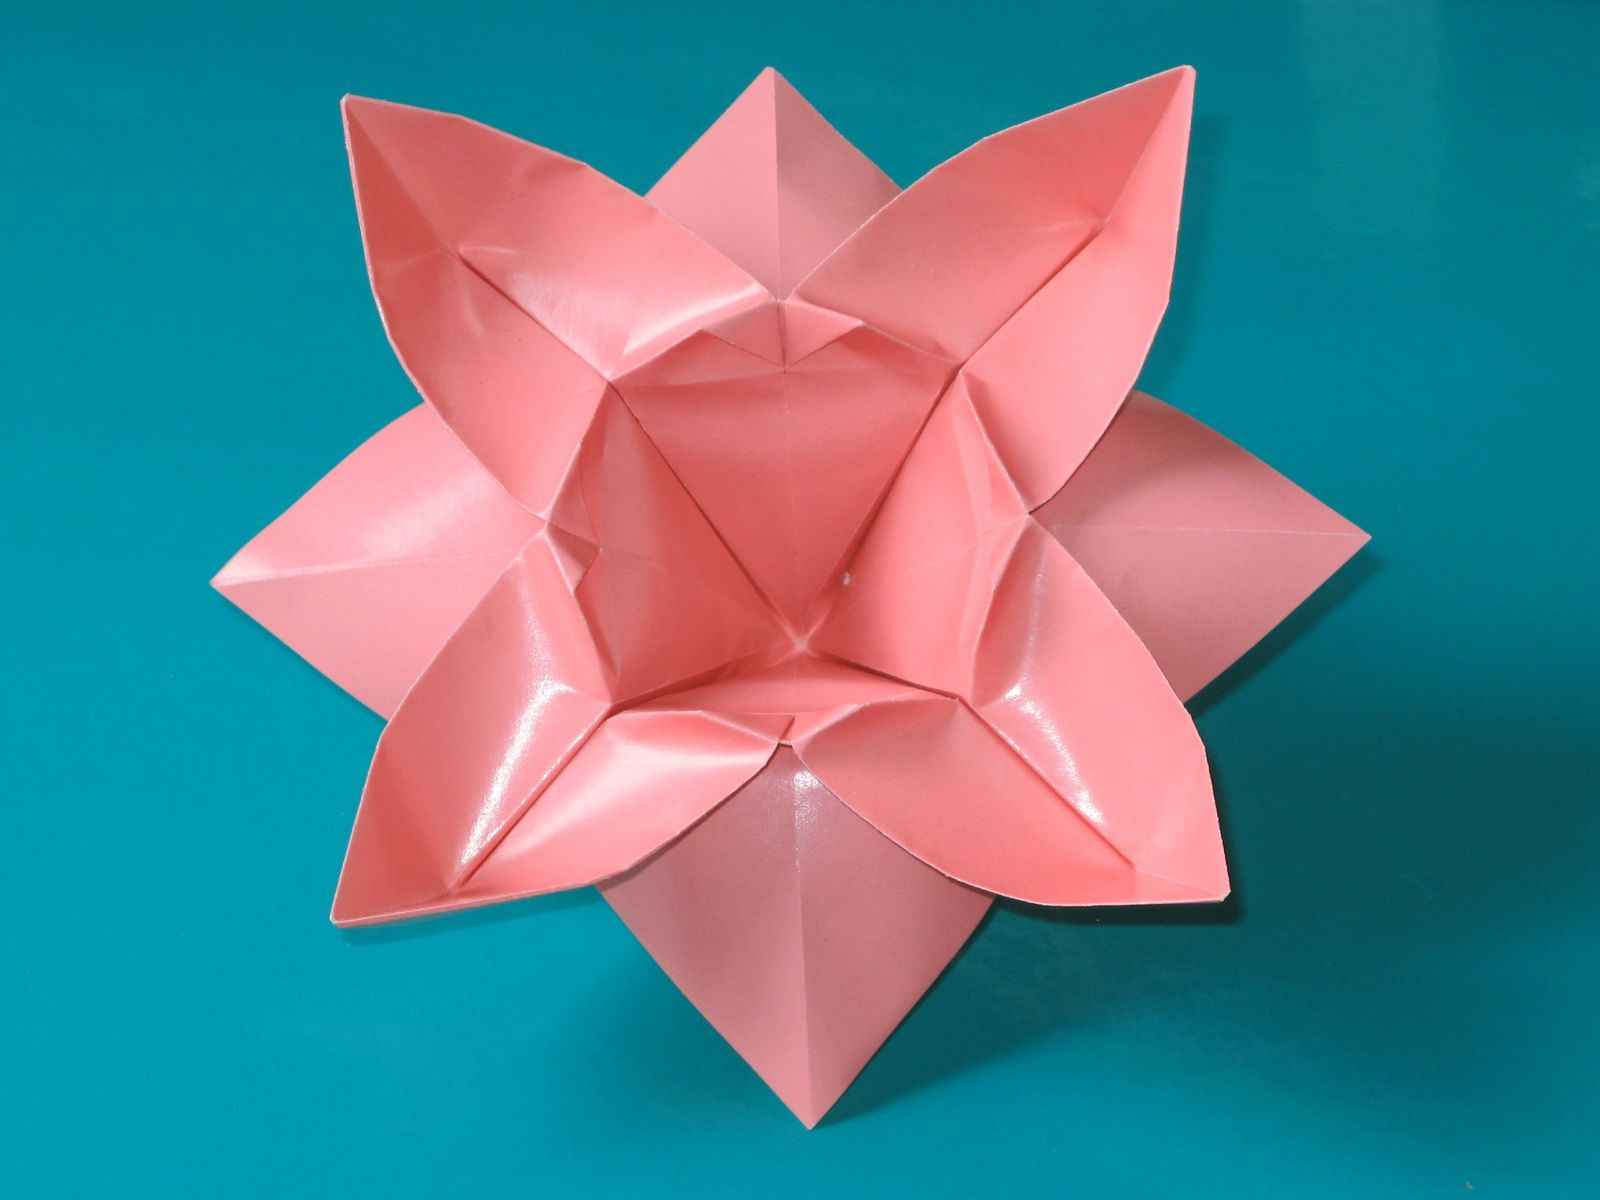 Origami poesie di carta: gennaio 2013 - photo#42